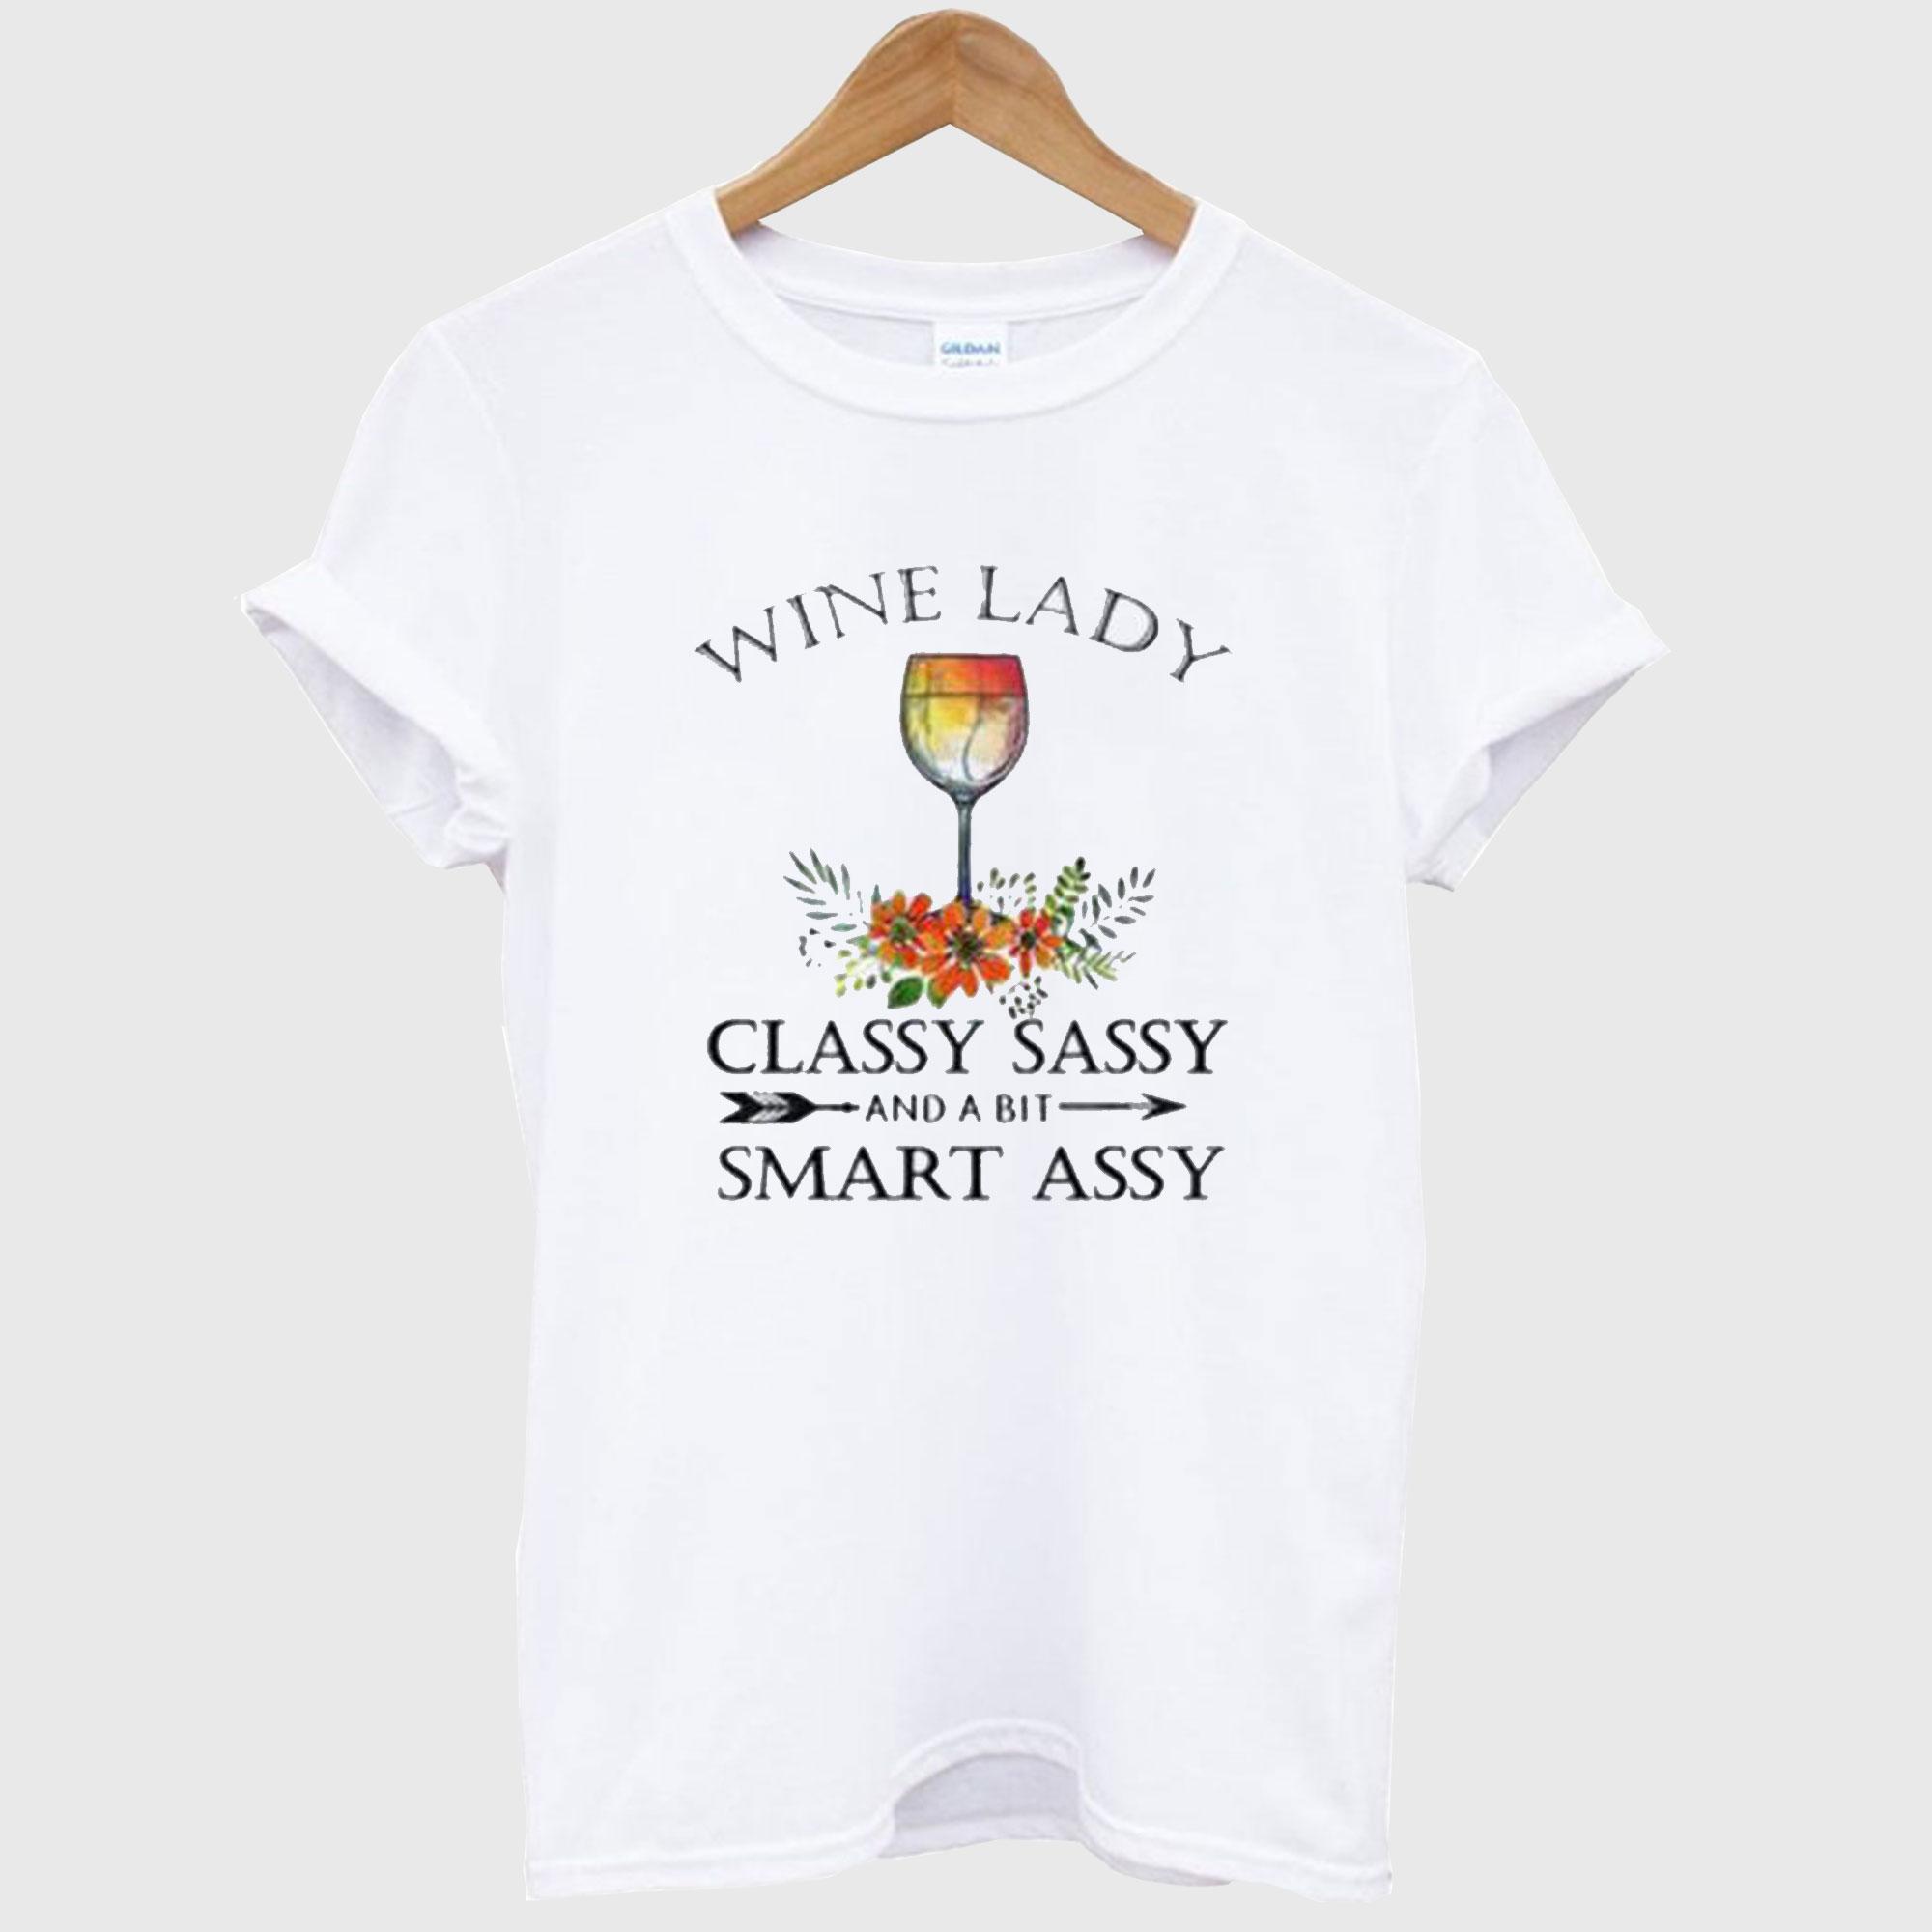 Wine Lady Classy Sassy And a Bit Smart Assy T-shirt